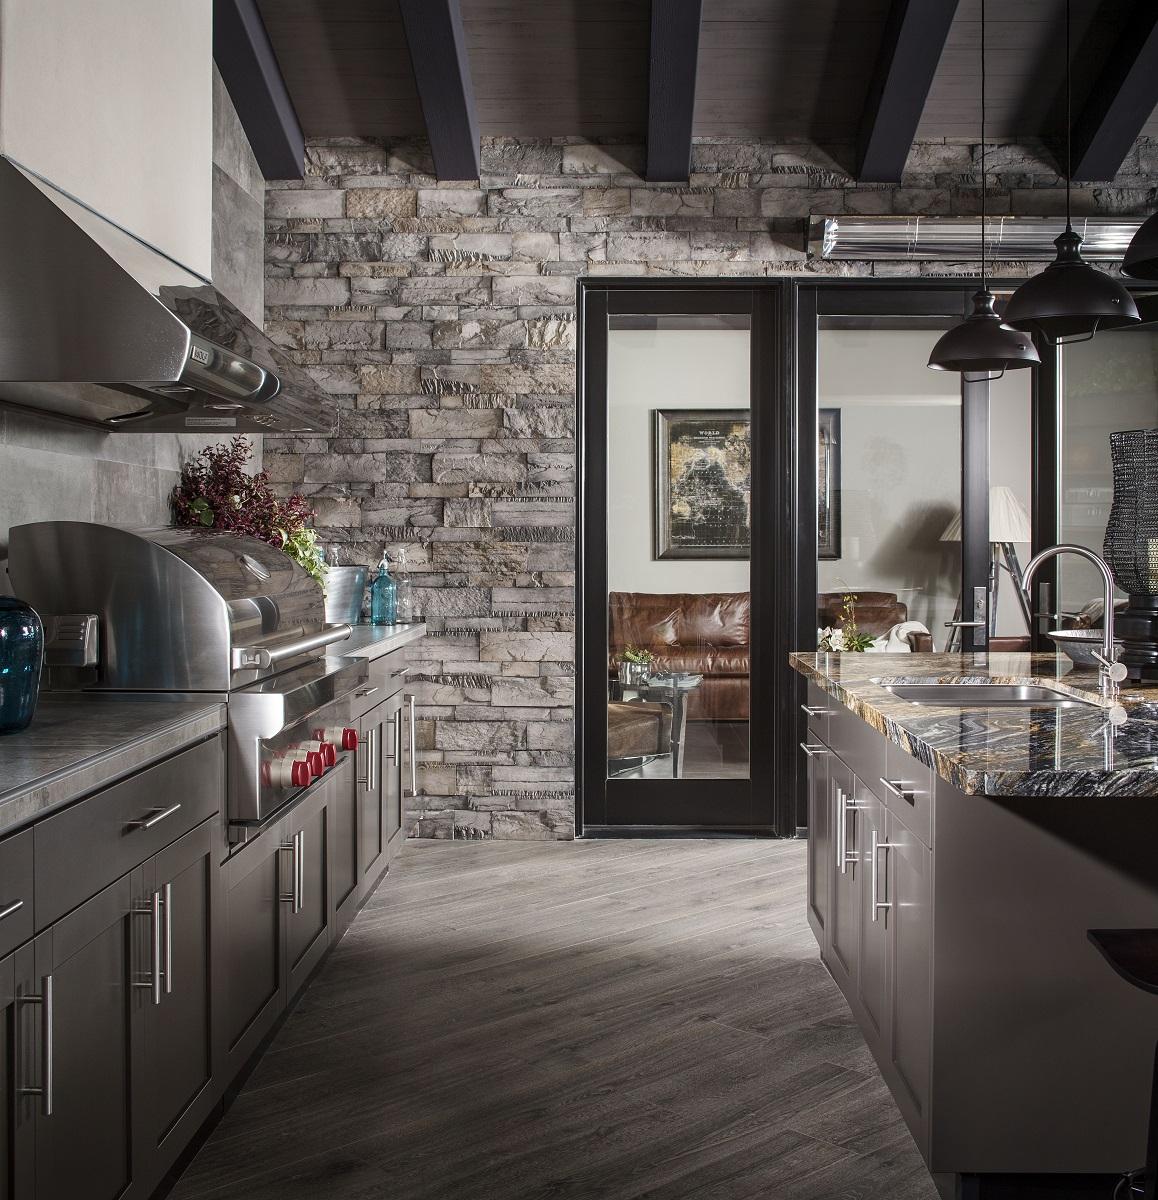 Stainless Steel Tall Kitchen Cabinet: Danver Stainless Outdoor Kitchen Metallic Bronze Matte